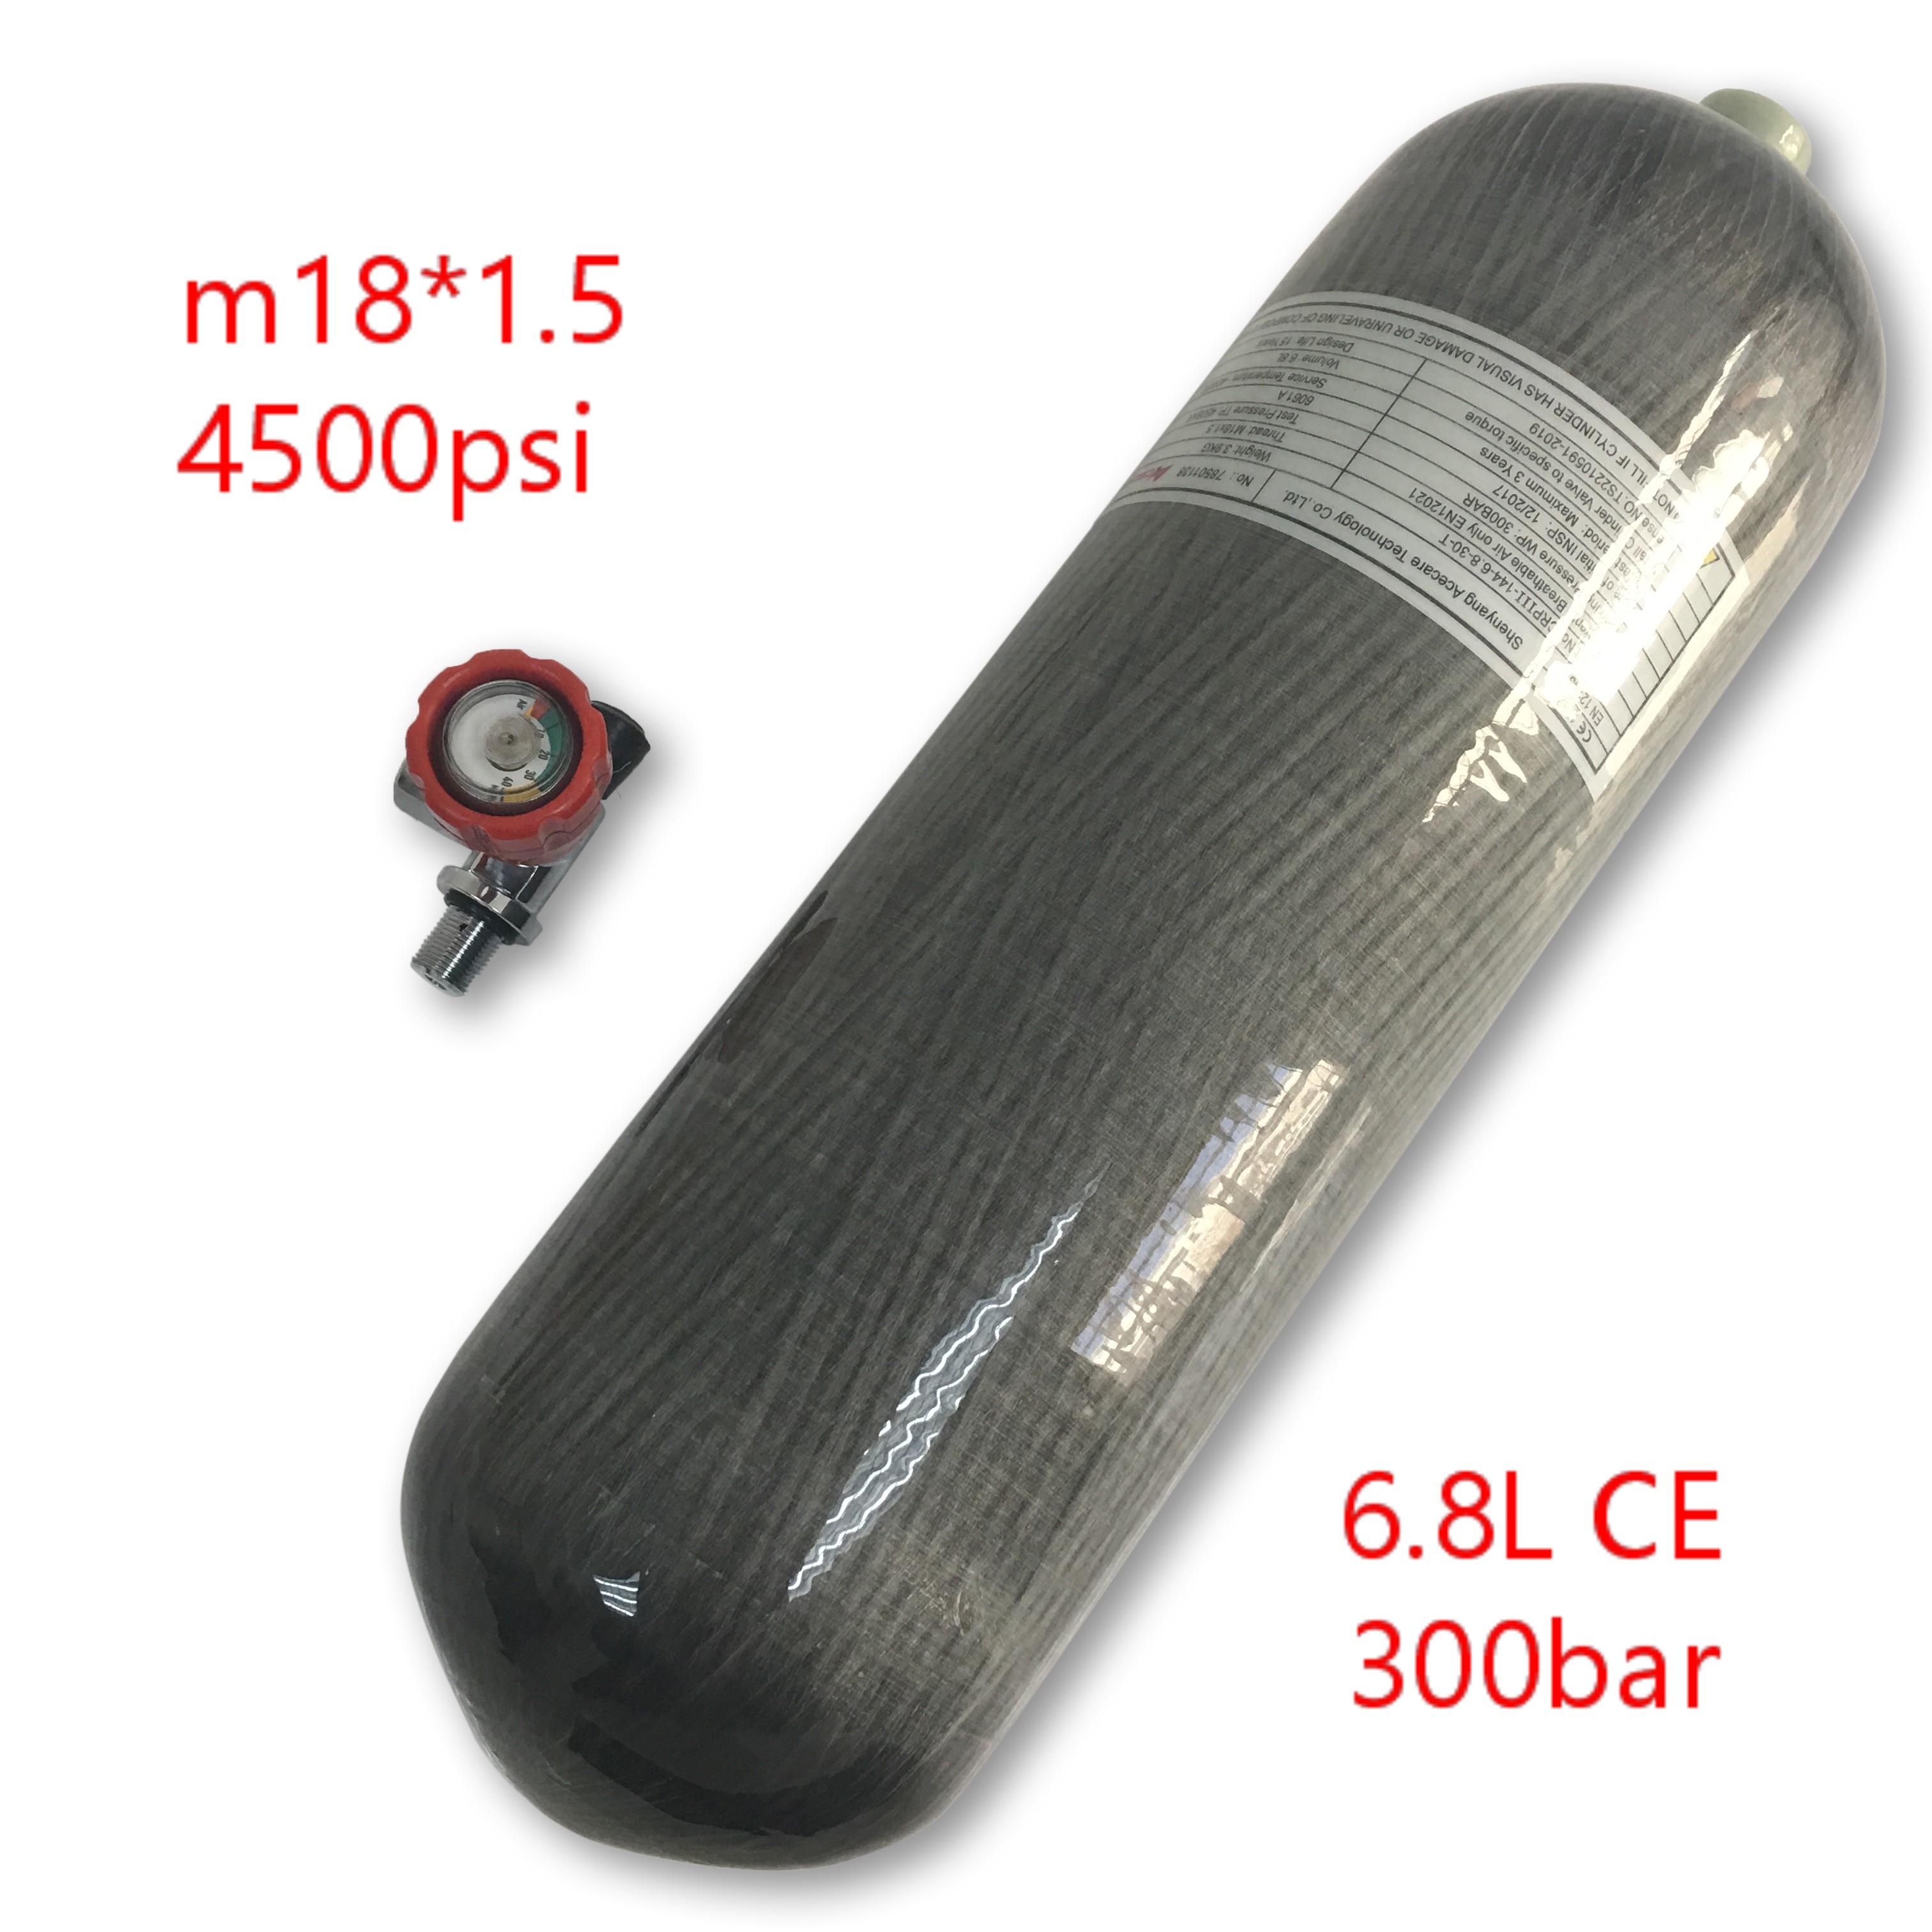 AC16811 6.8L CE Pcp Paintball Cylinder 4500Psi Carbon Fiber Air Tank Diving Valve Scuba Cylinder Underwater Gun Condor Acecare